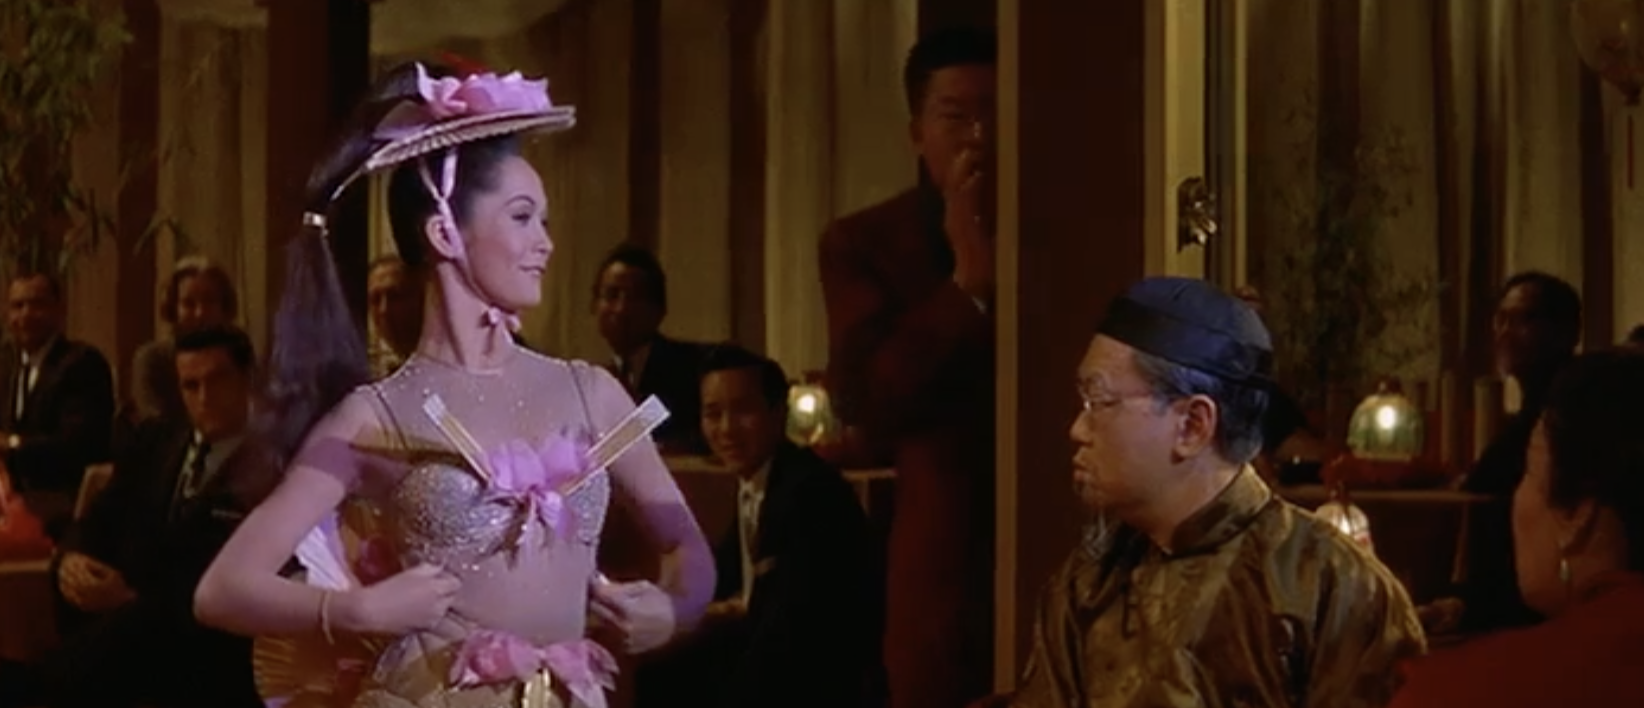 Nancy Kwan as Linda Low revealing a little too much of herself for Master Wang (Benson Fong)